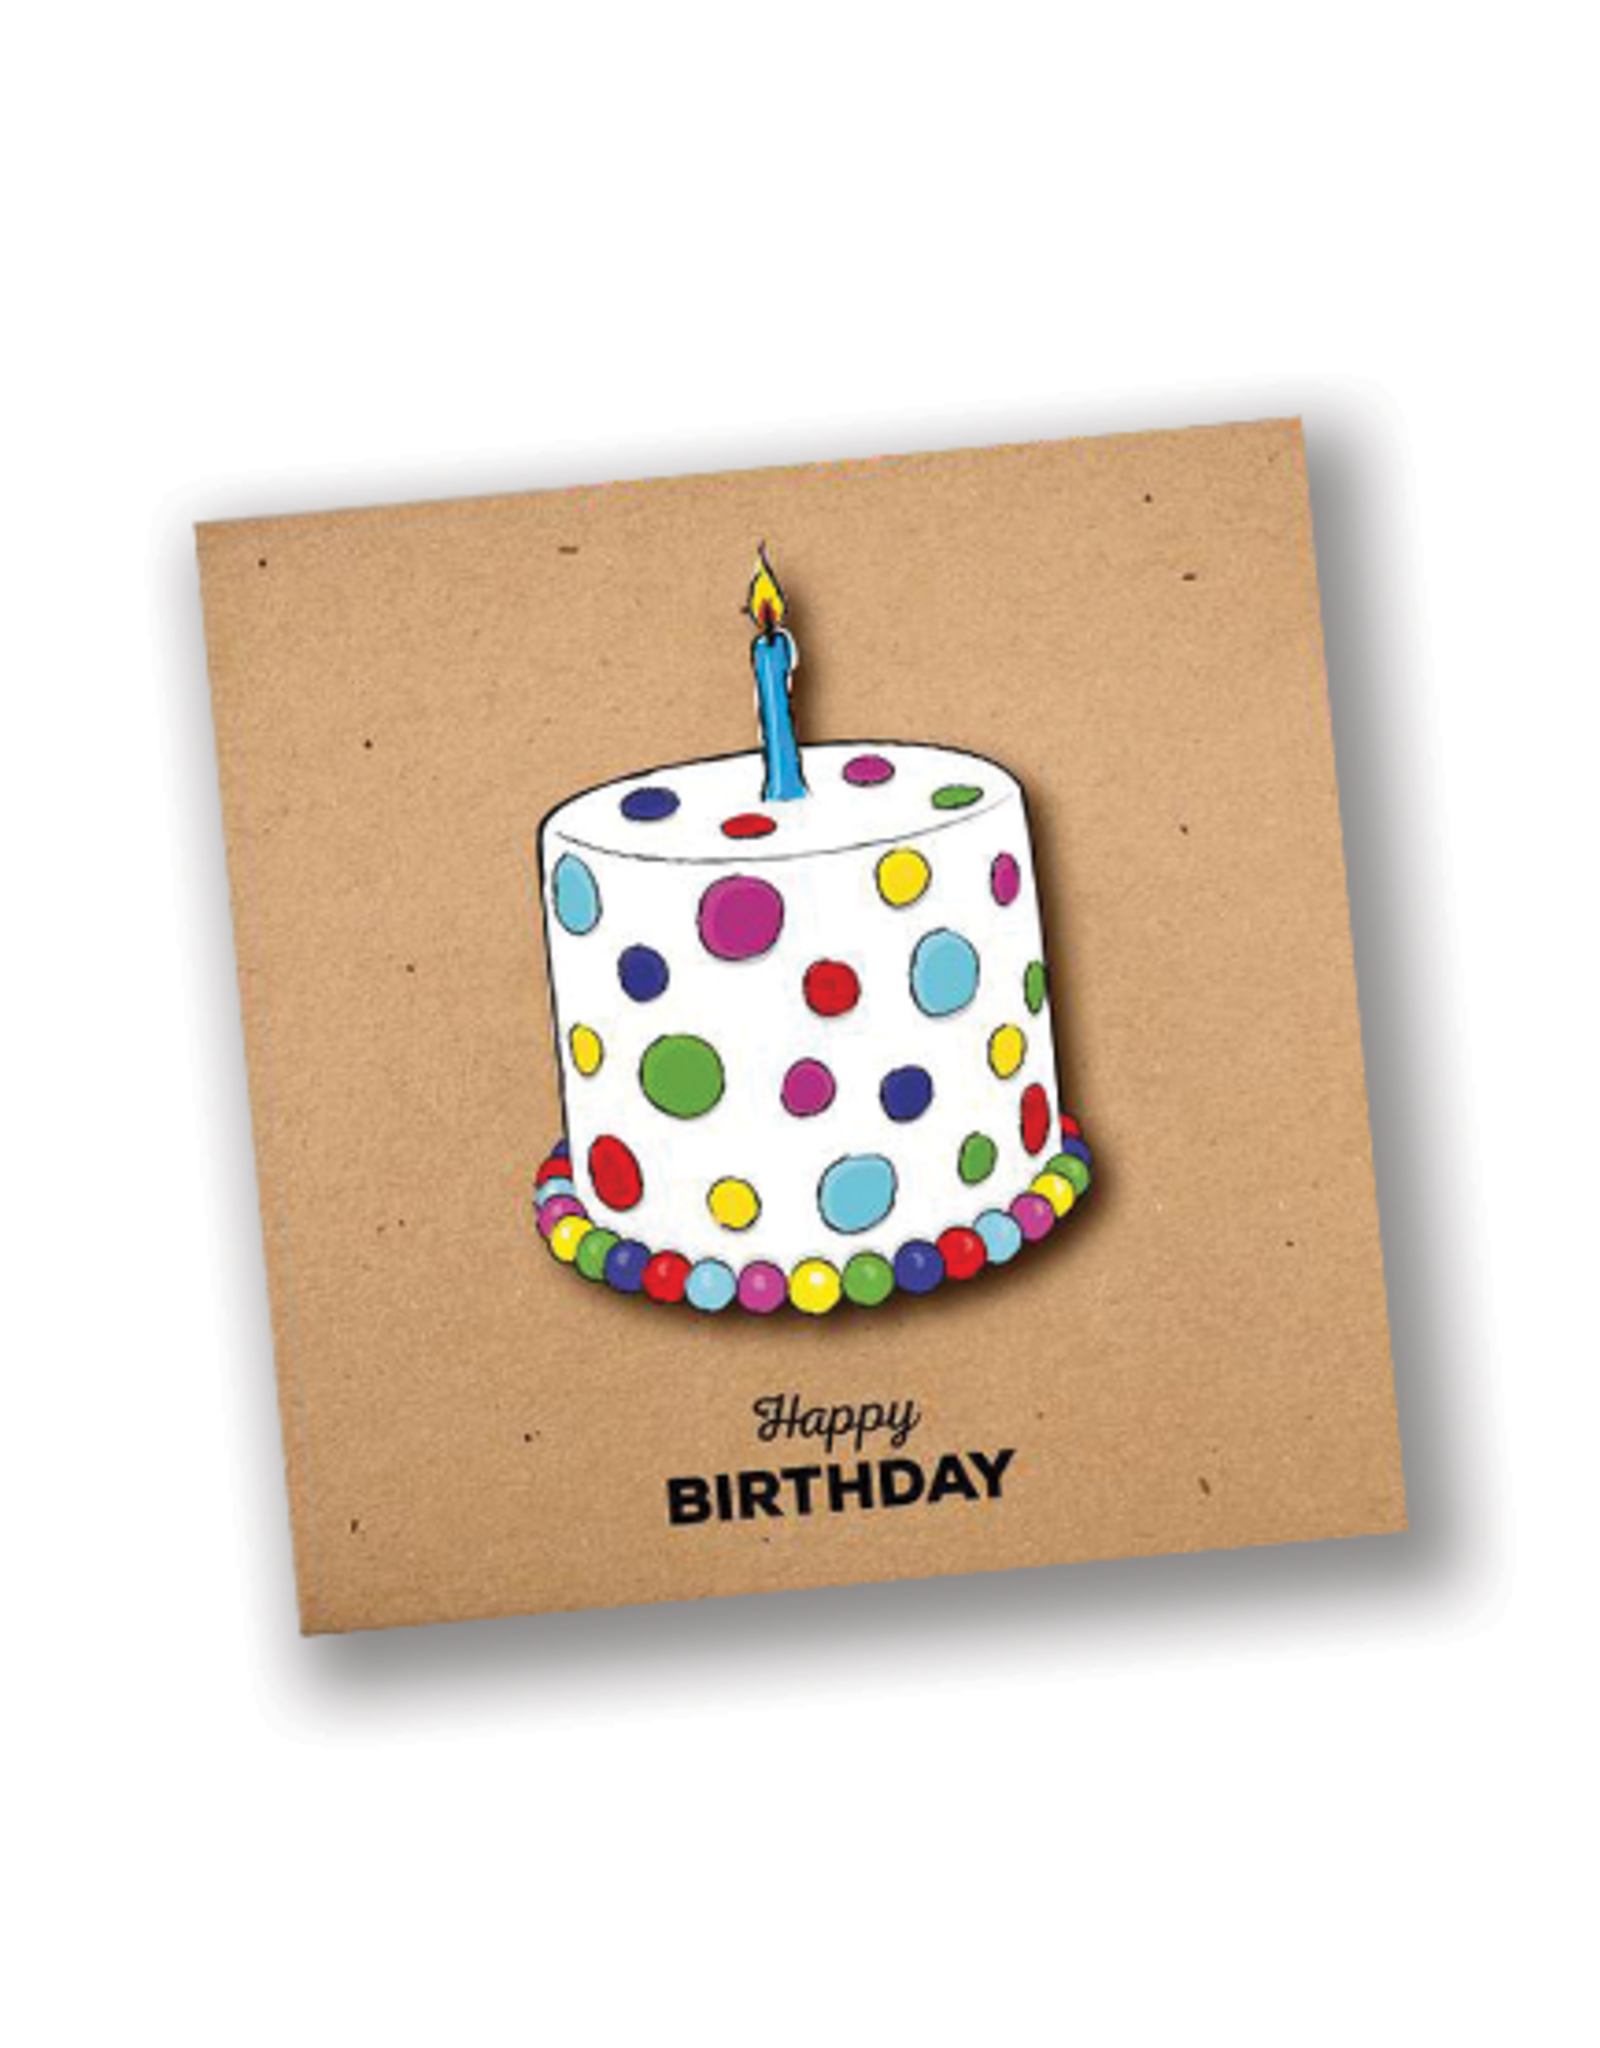 """Happy Birthday"" Polka Dot Cake Card"